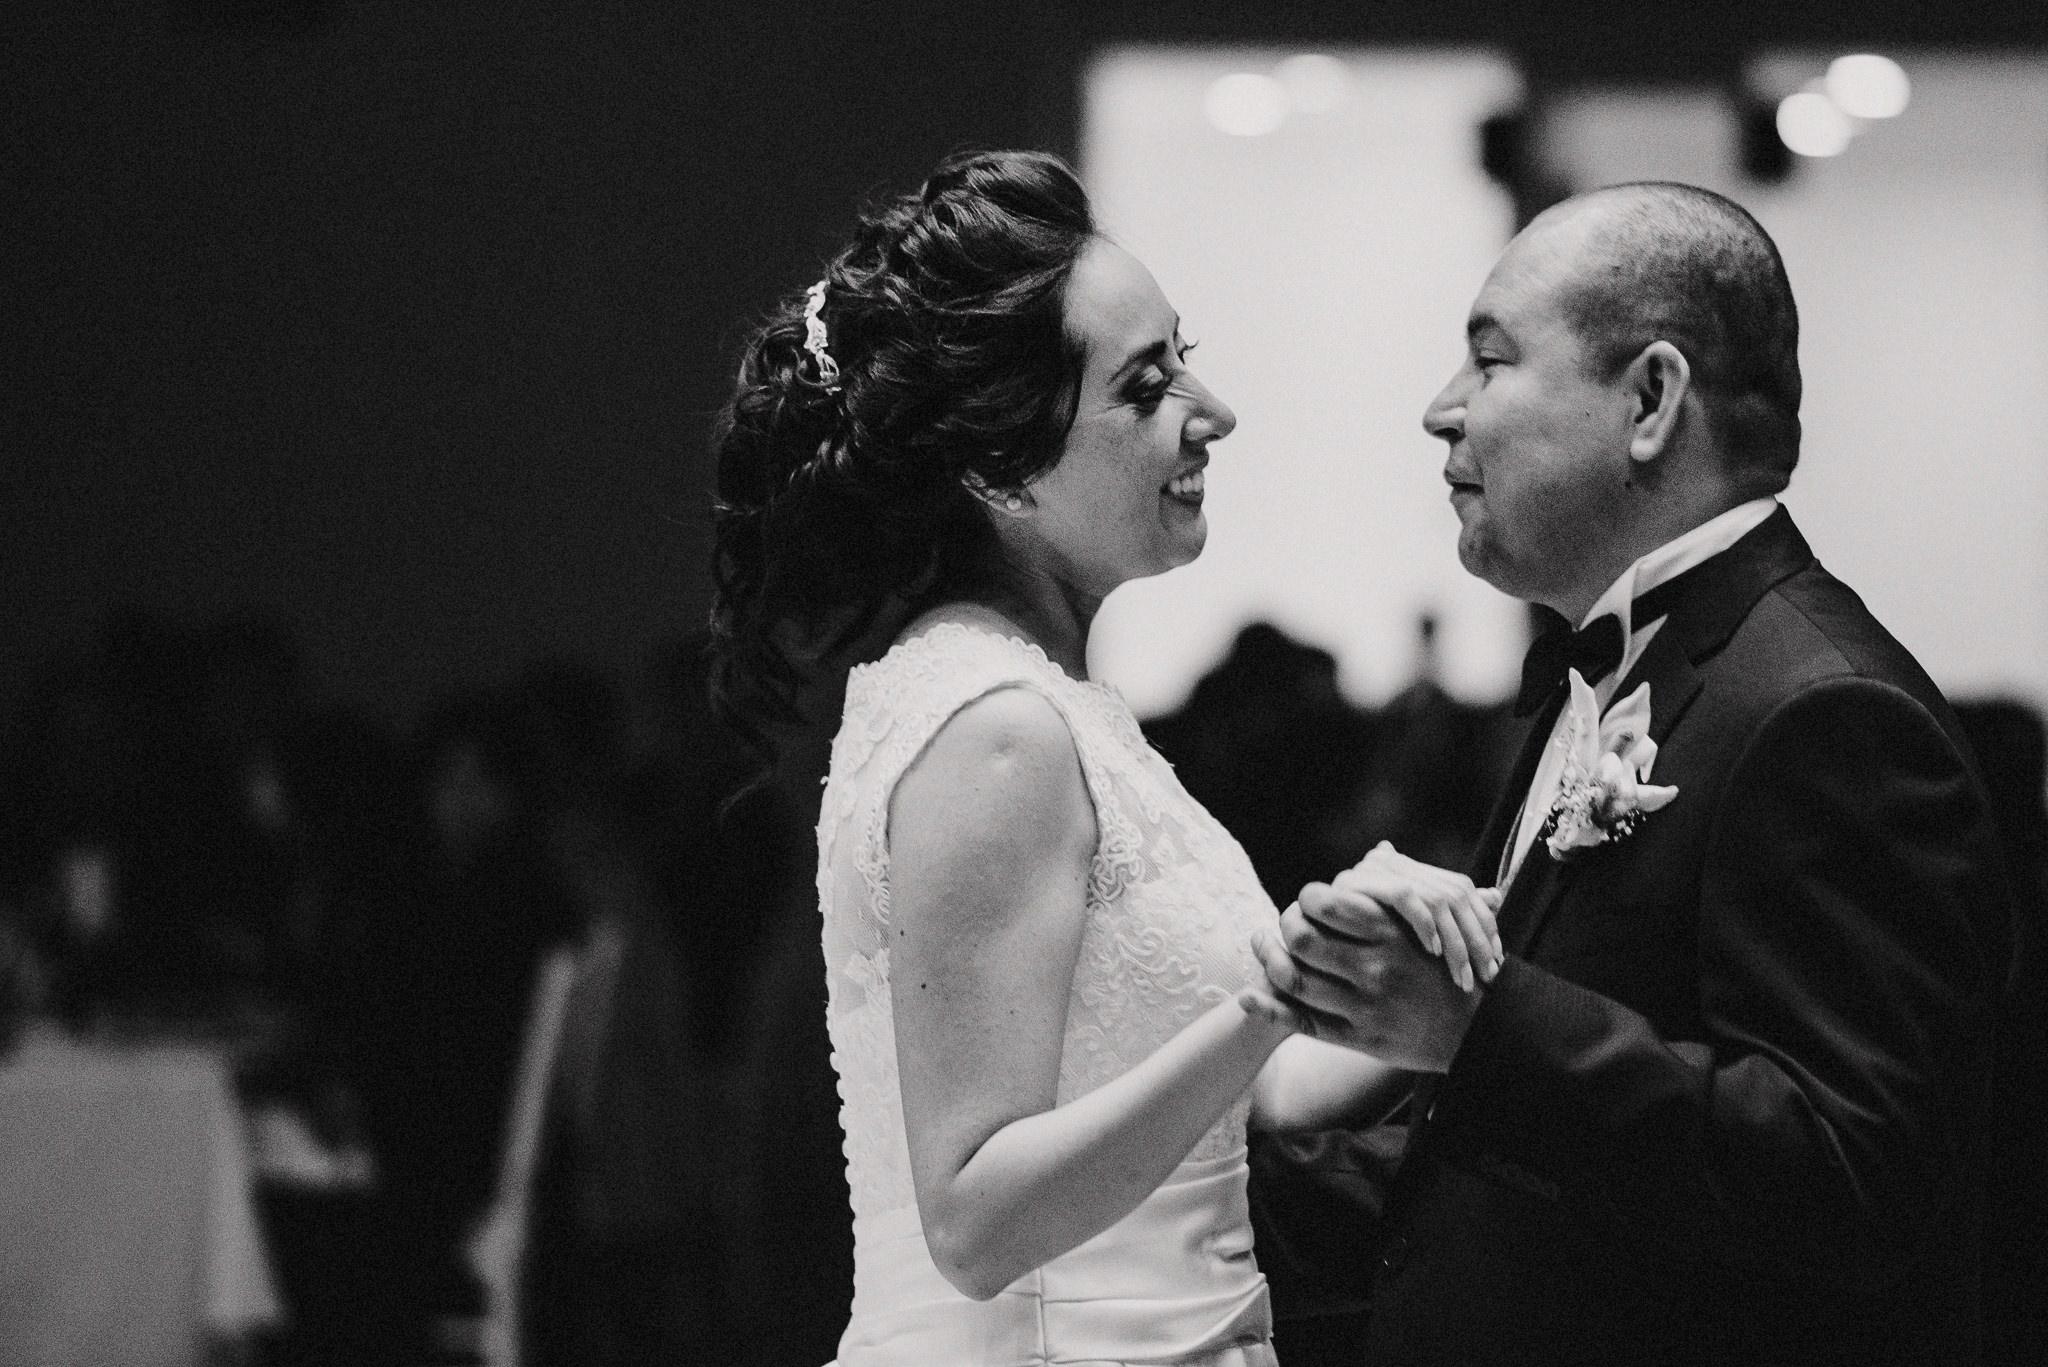 Wedding-Boda-Tulancingo-Hidalgo-Salon-Essenzia-Luis-Houdin-53-film